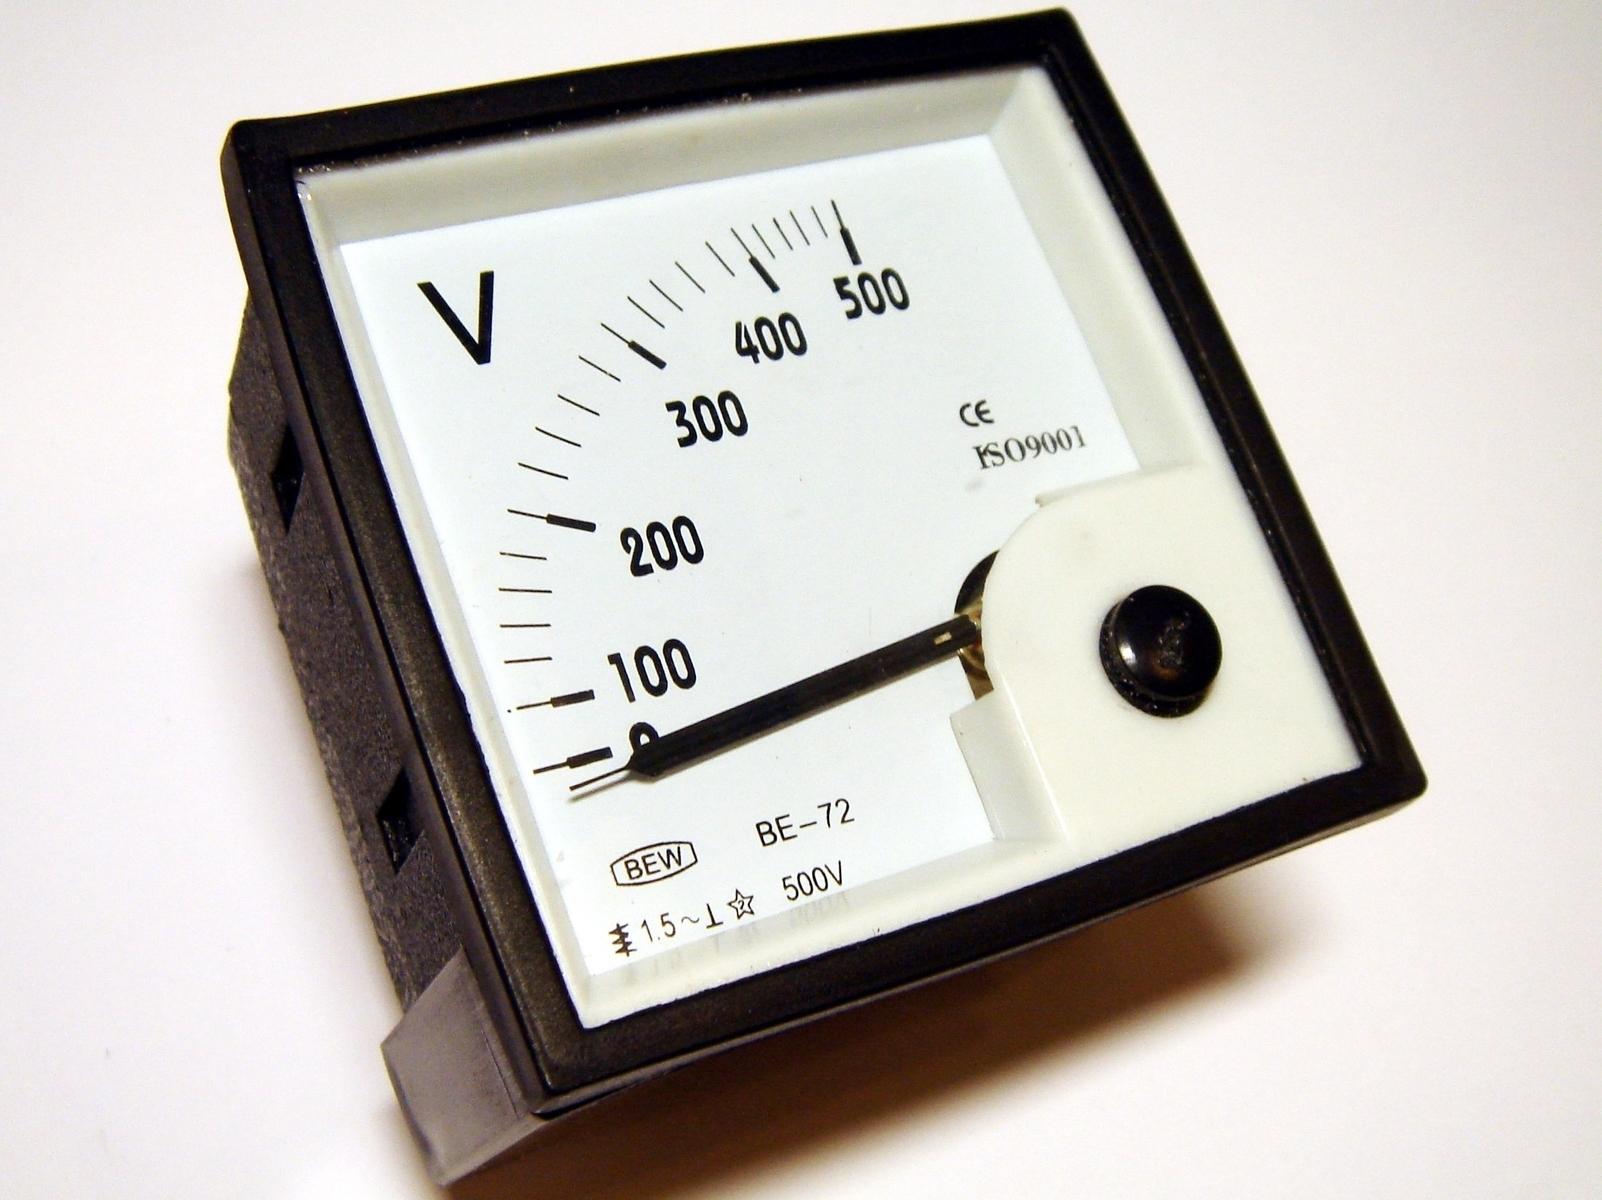 Voltmeeter analoog 0-500V, BE-72, Bew